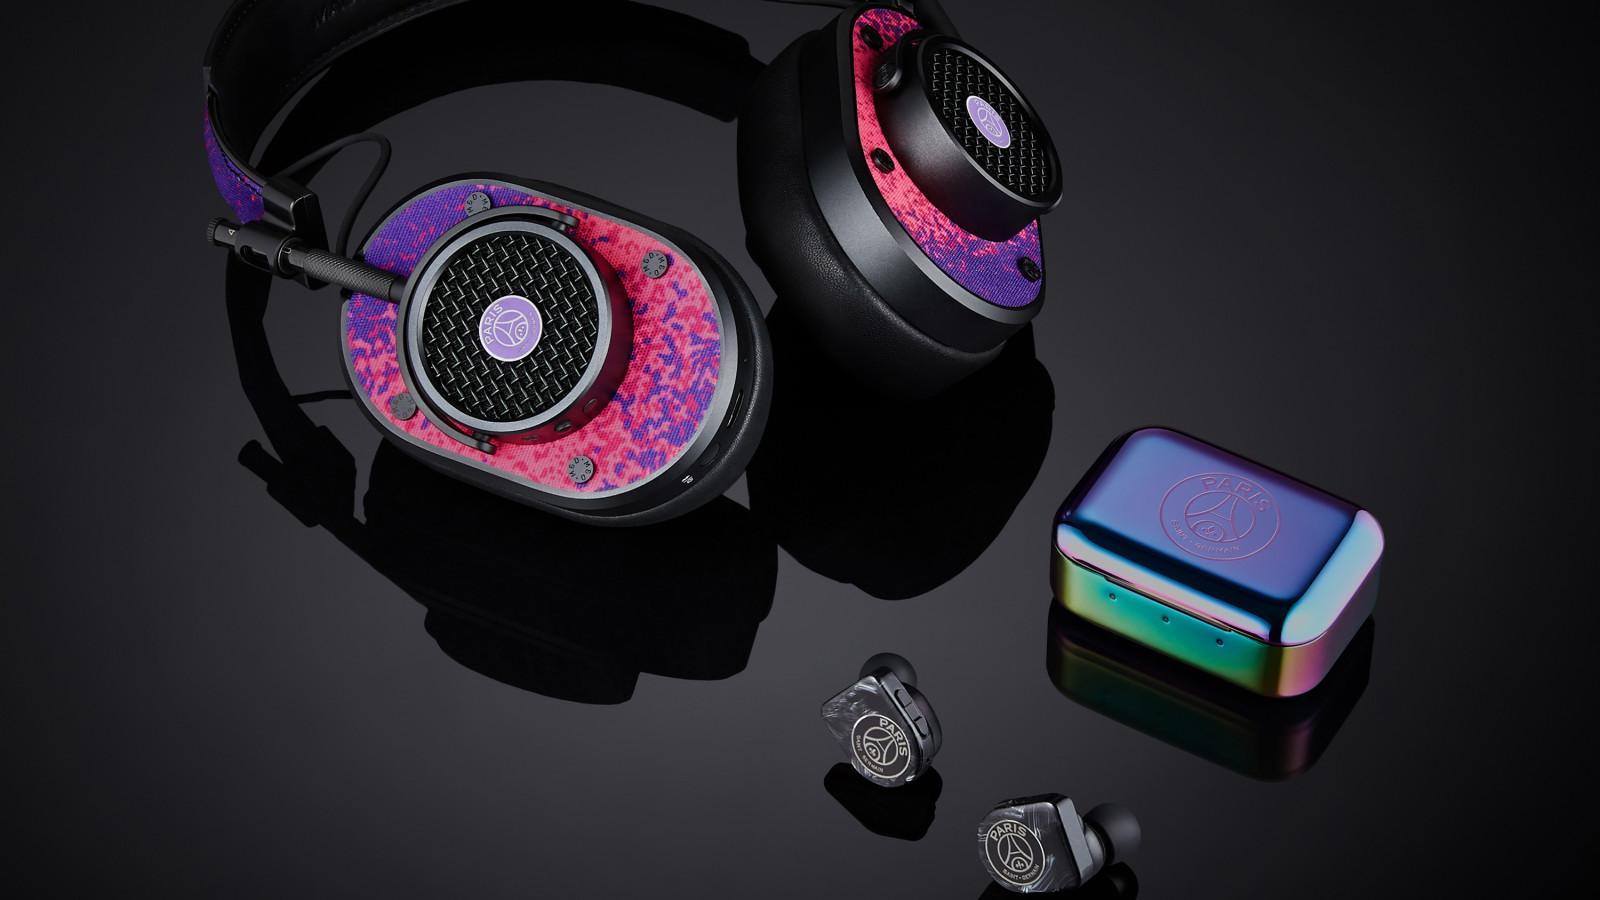 Master & Dynamic präsentiert neue Kopfhörer-Kollektion für Paris Saint-Germain.